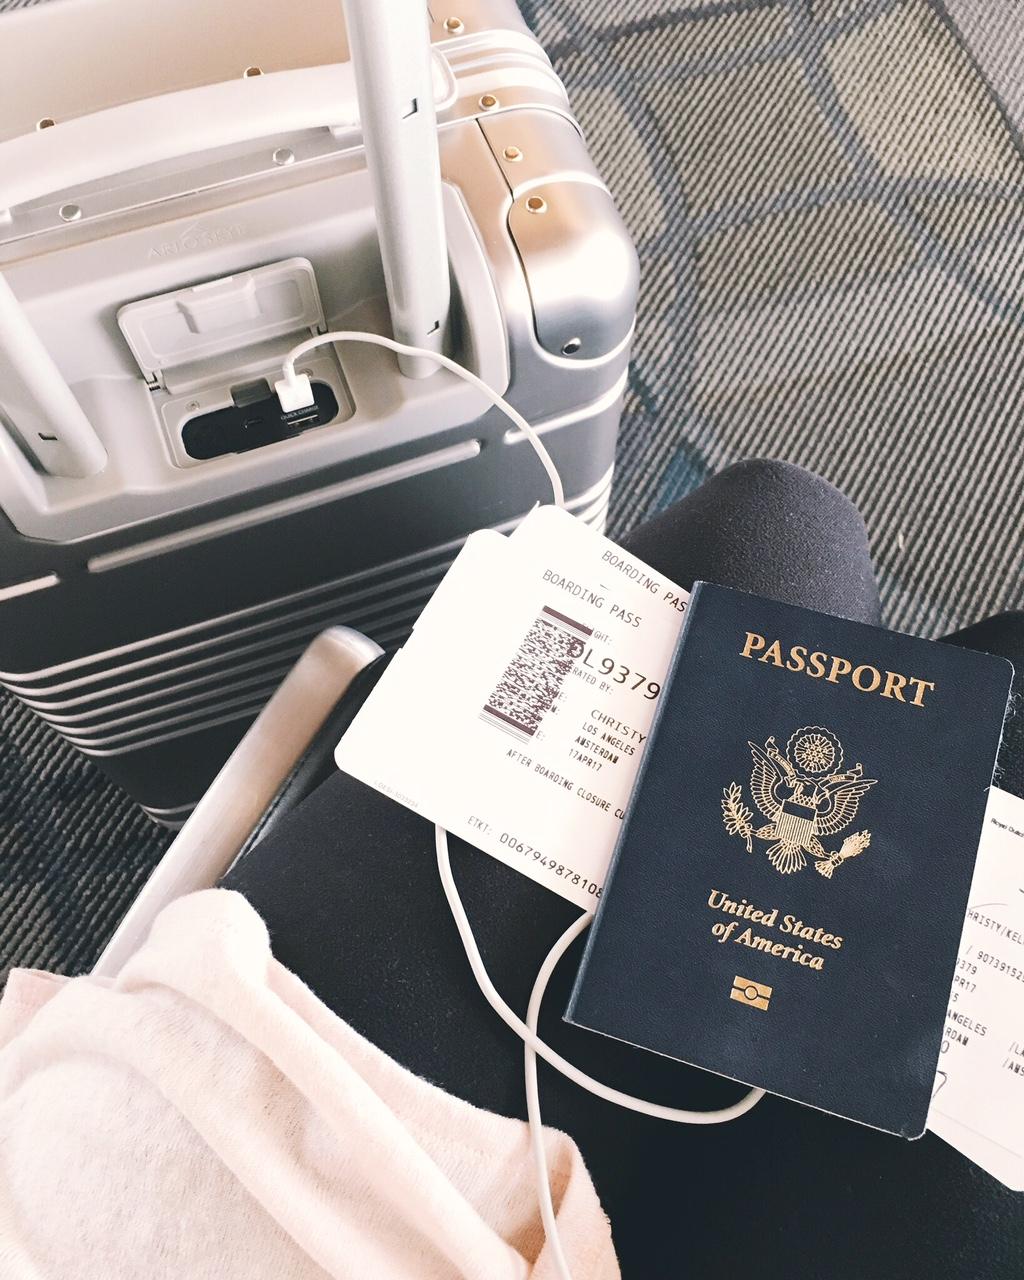 Pink sweater black leggings boarding pass US Passport champagne Arlo Skye carry on luggage